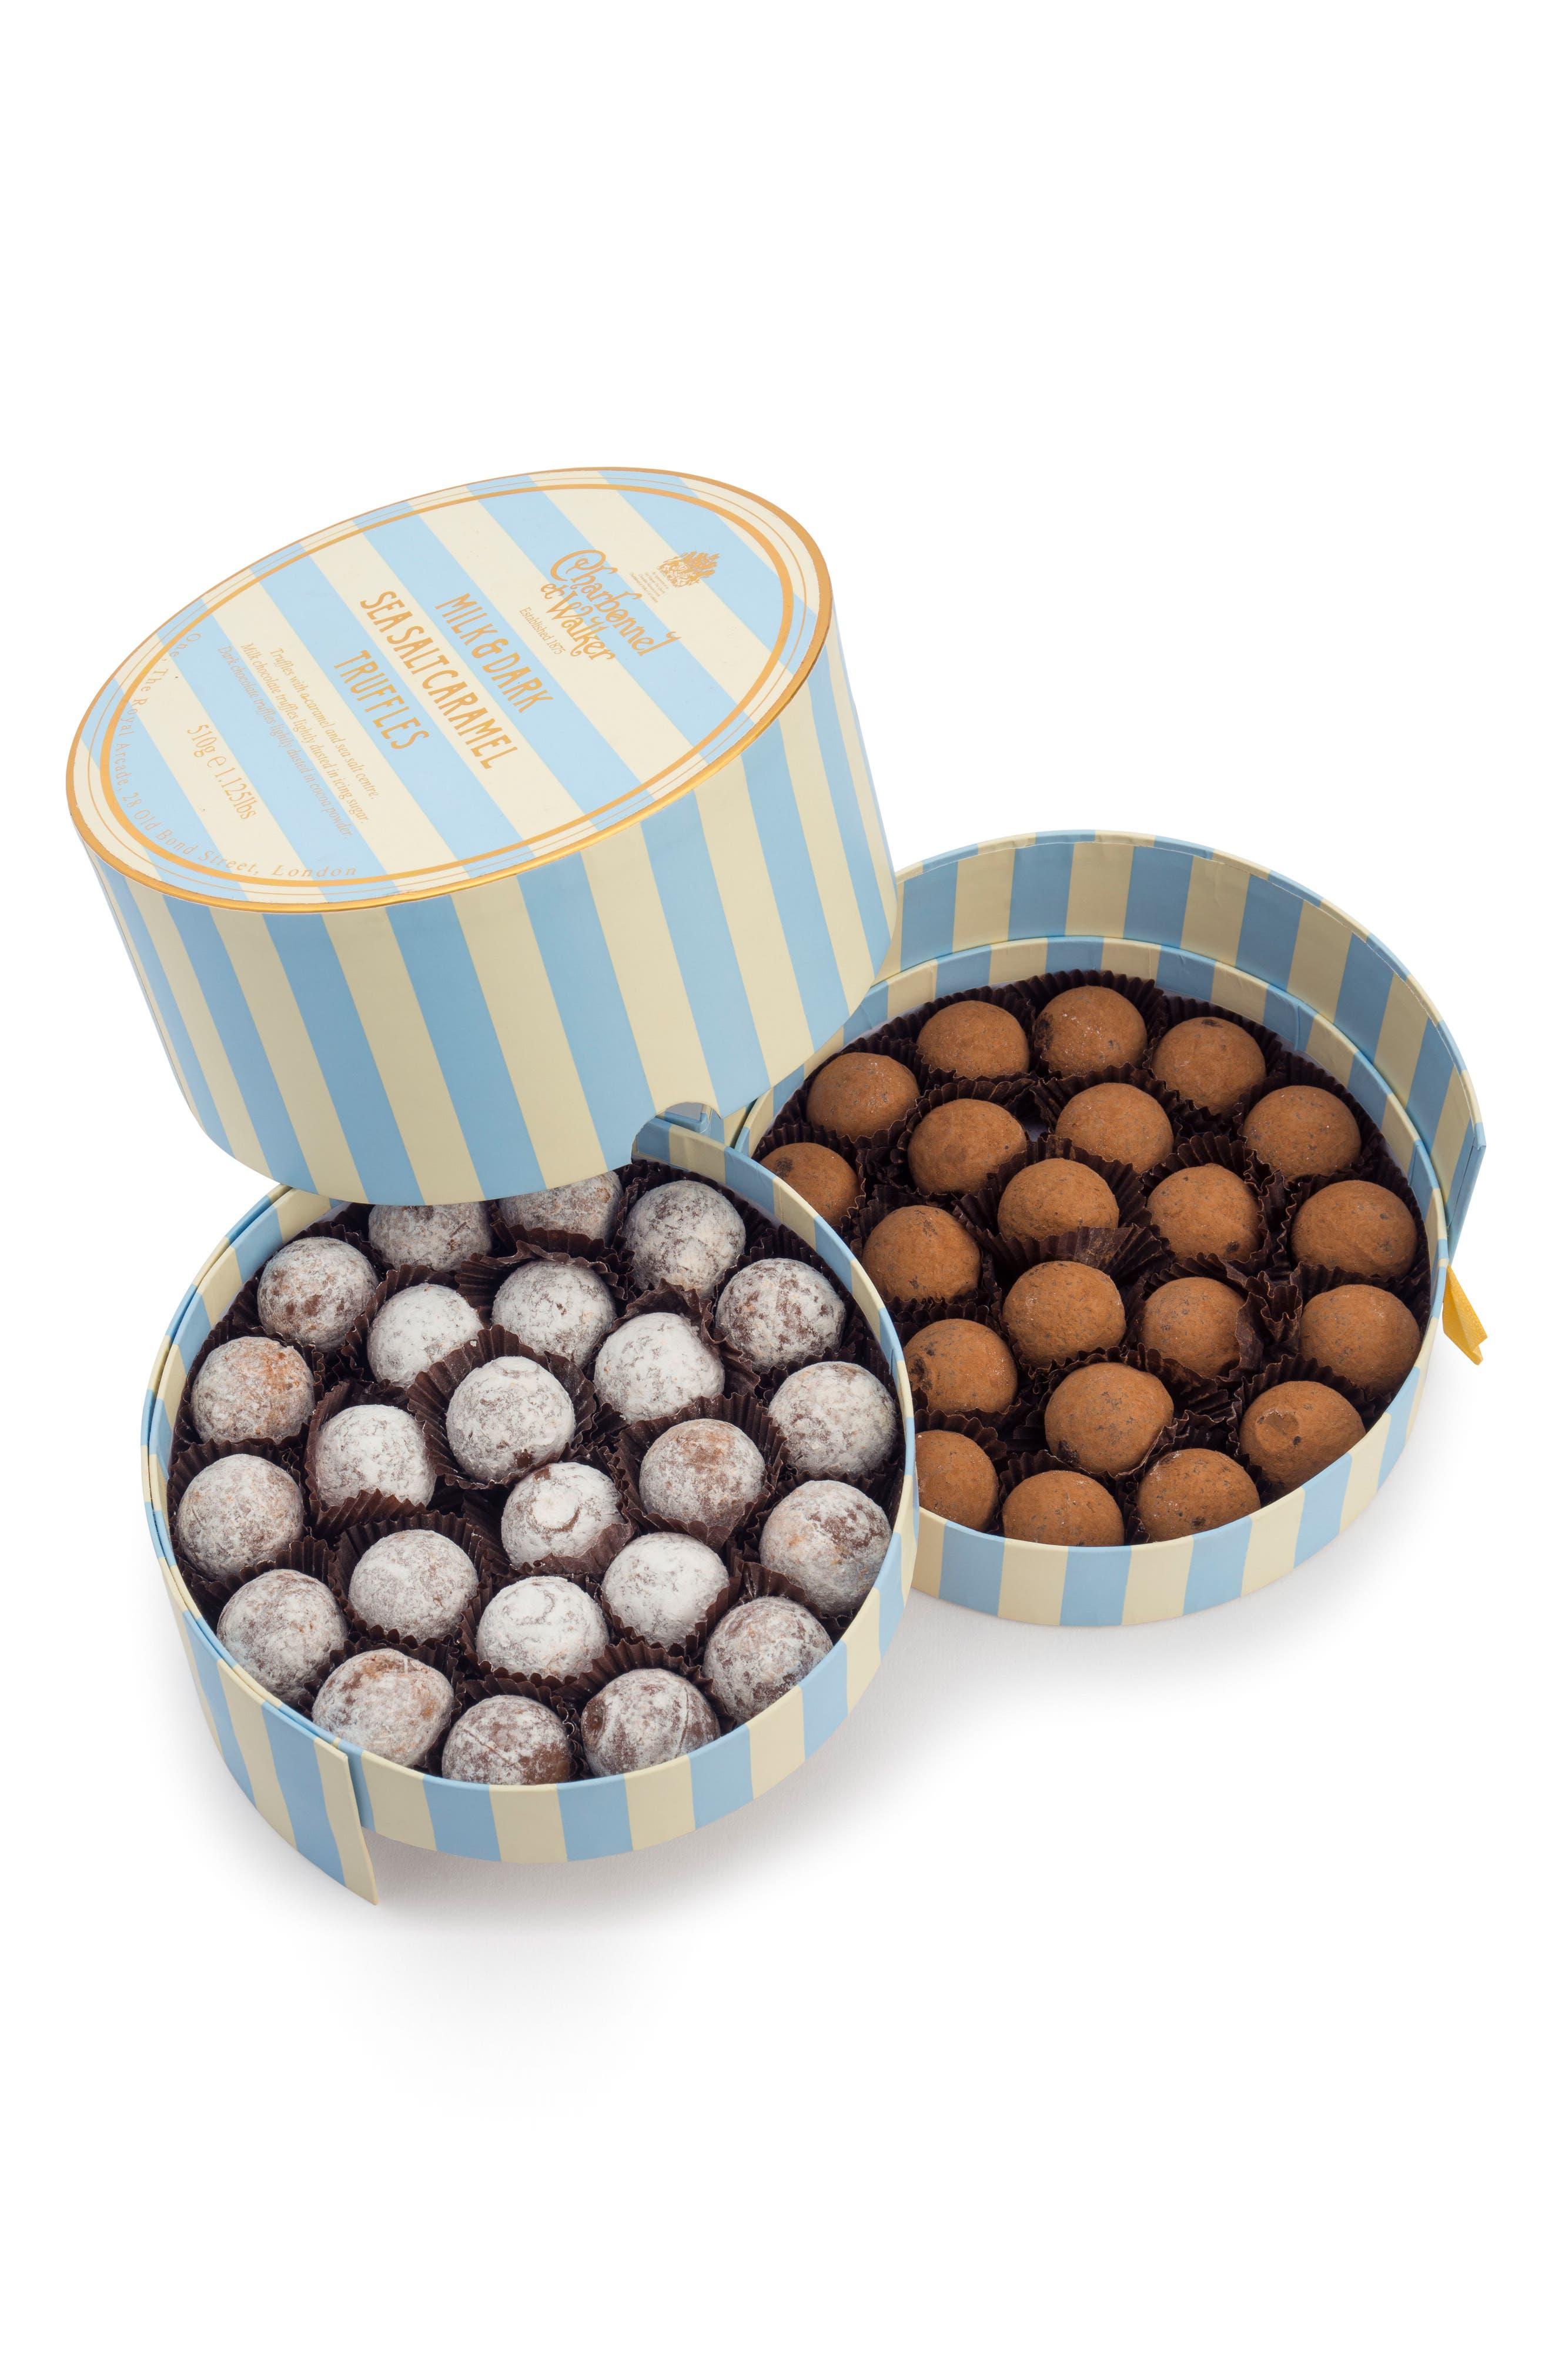 Flavored Chocolate Truffles in Gift Box,                         Main,                         color, MILK/ DARK SEA SALT